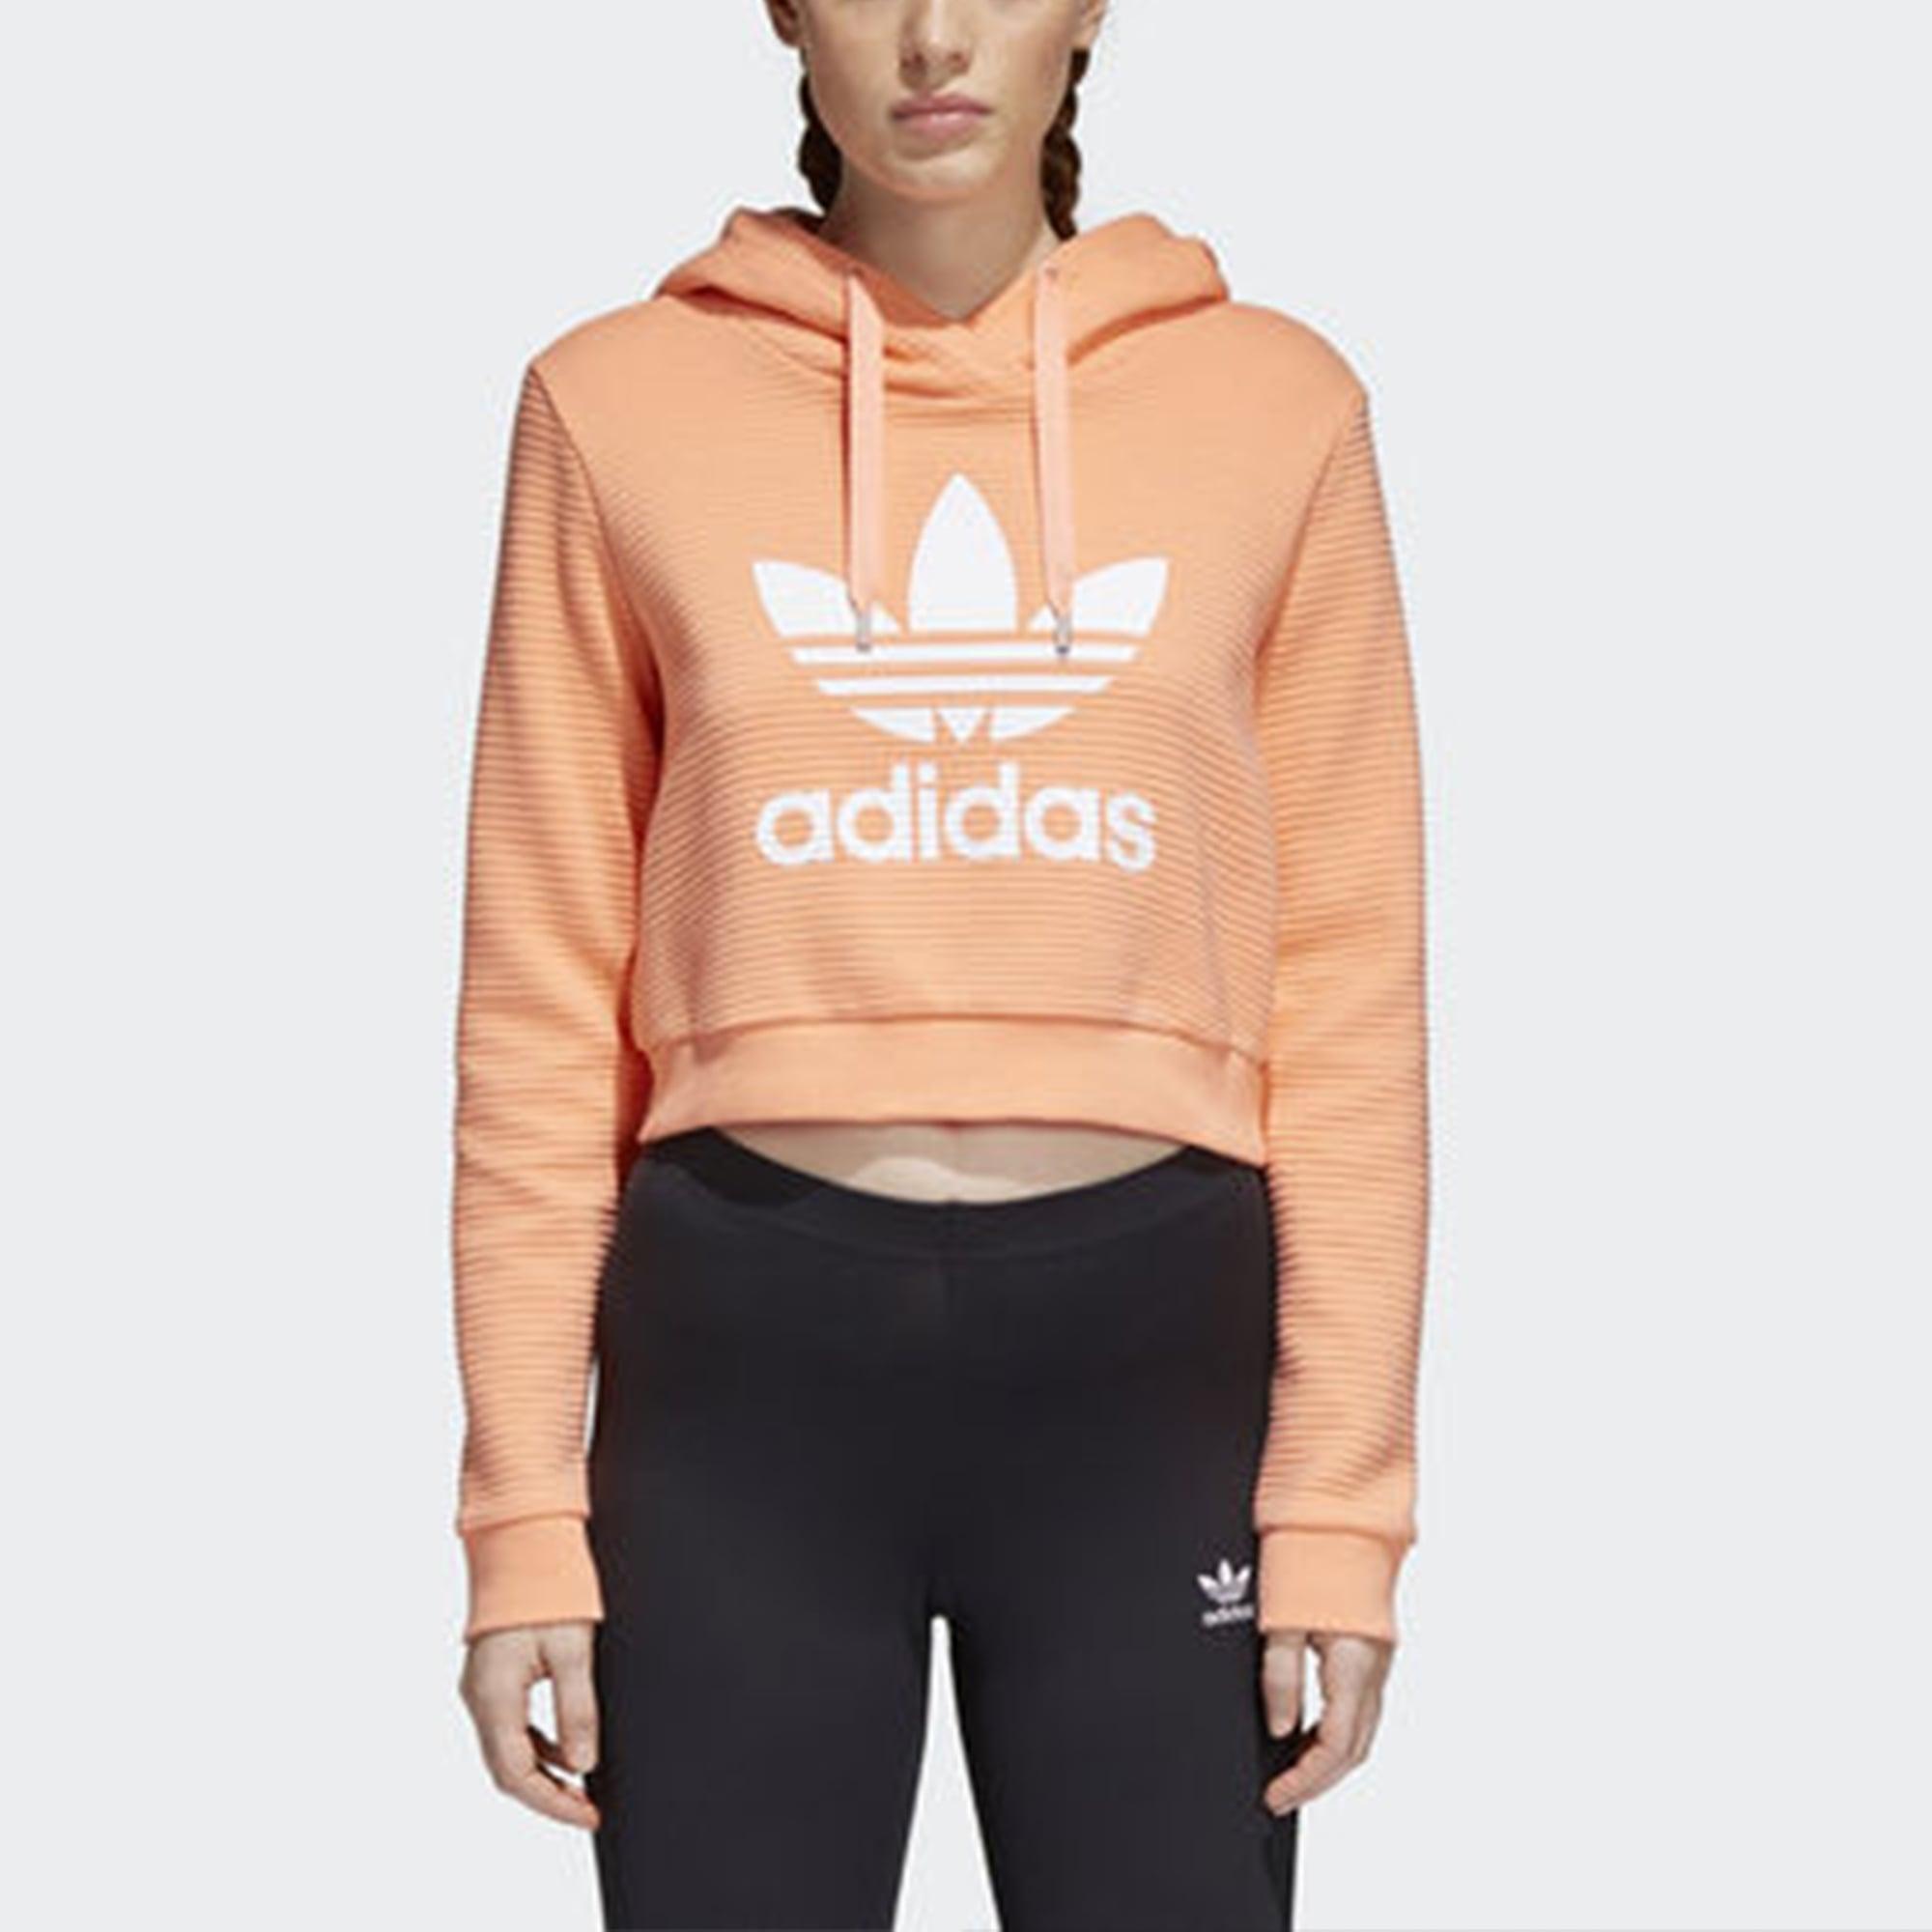 adidas Originals Damen Sweater Sweatshirt Pullover